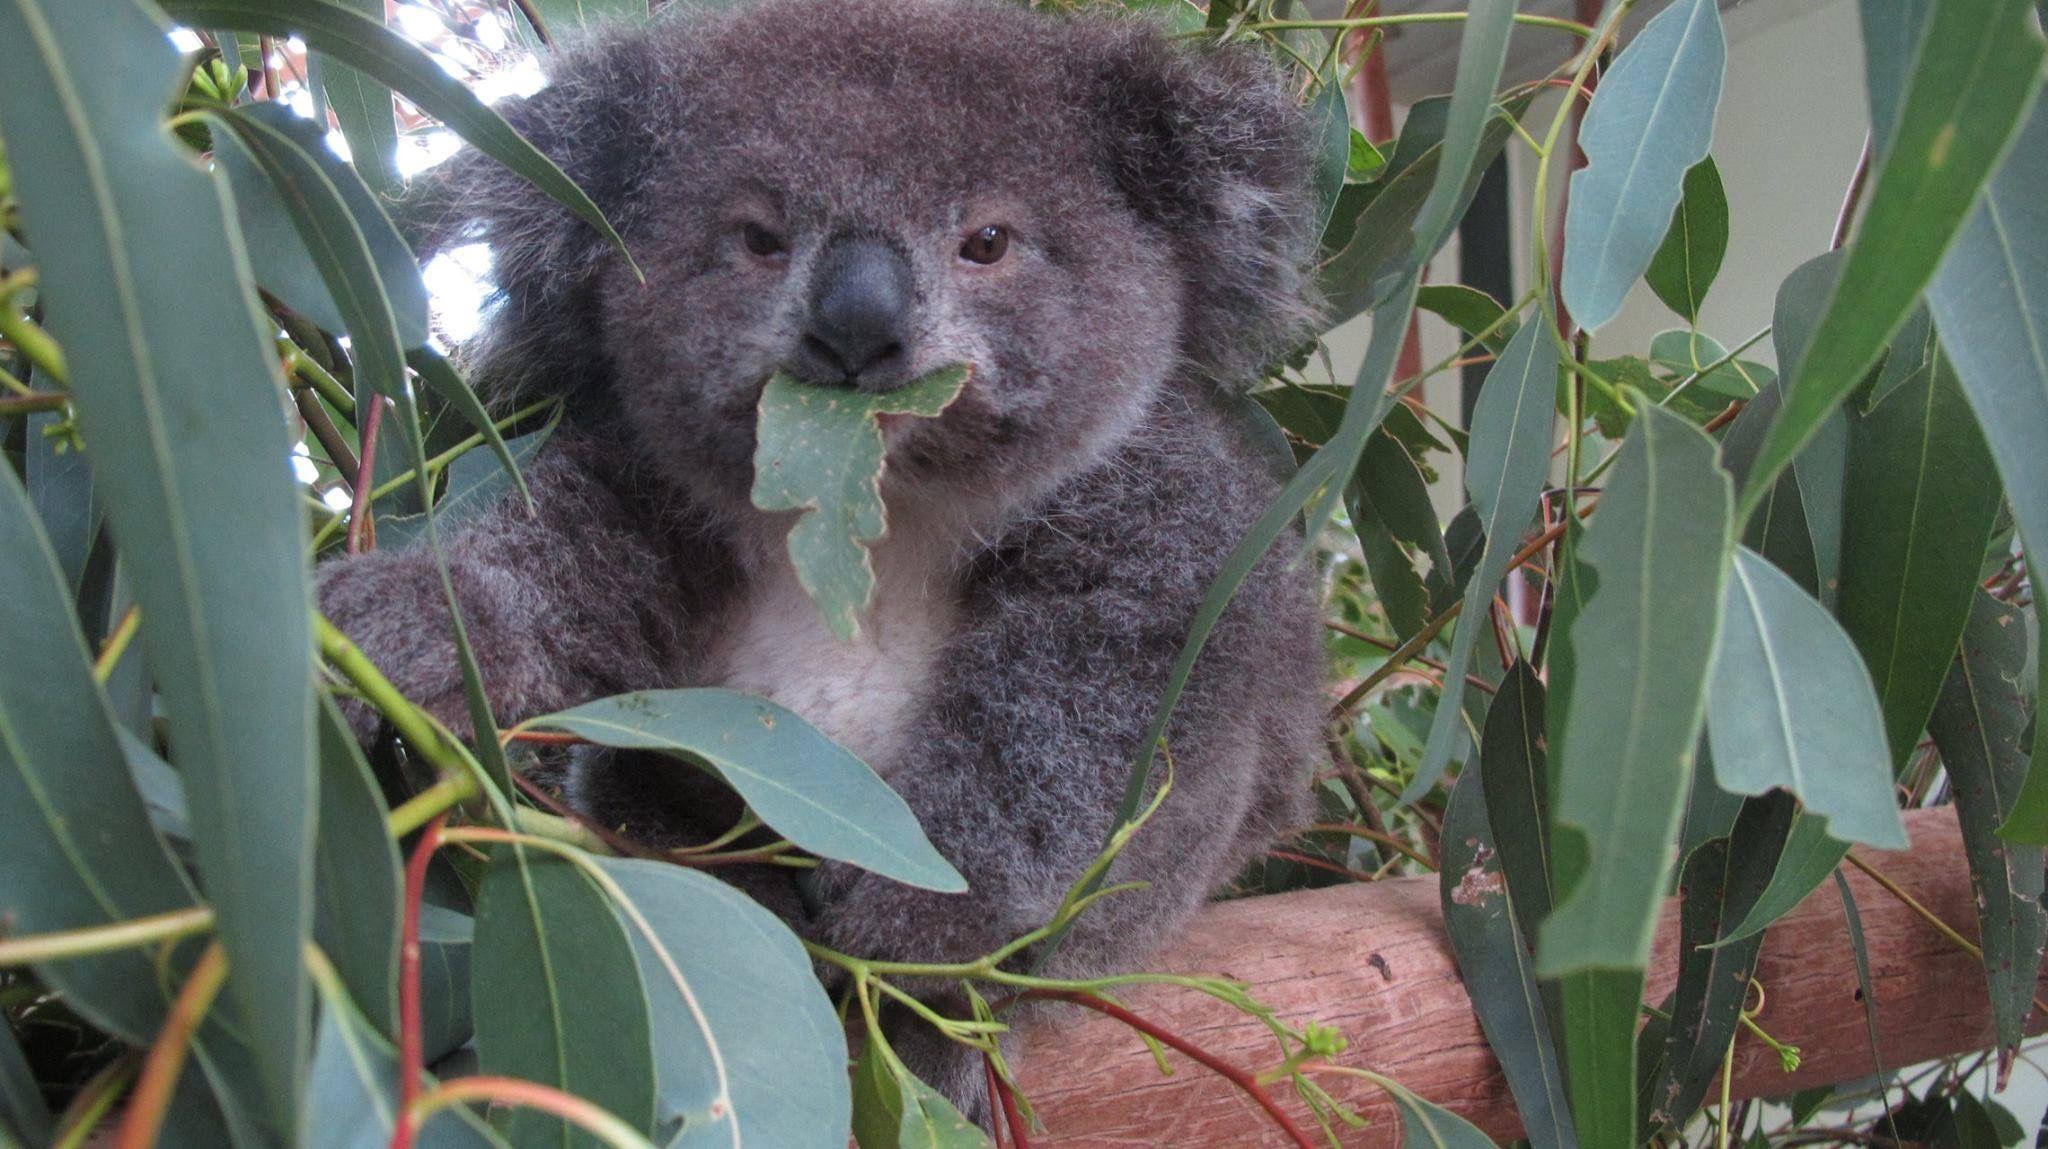 Pin By Adamllover Dutcher On Cute Koalas Pinterest Baby Koala